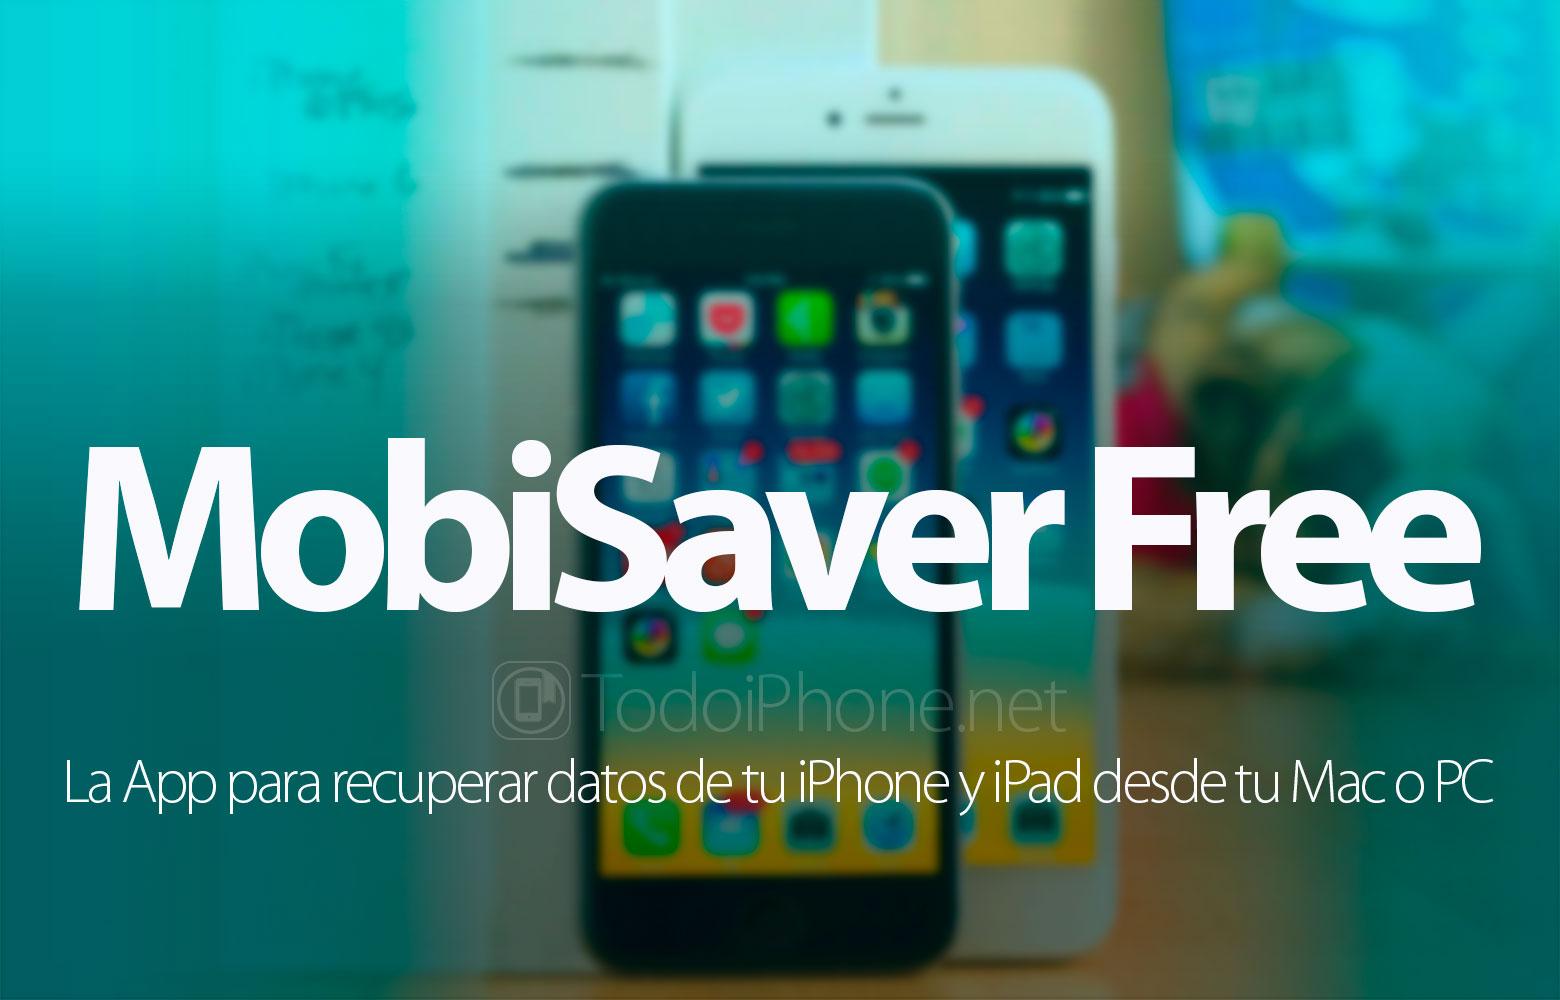 mobisaver-free-recuperar-datos-iphone